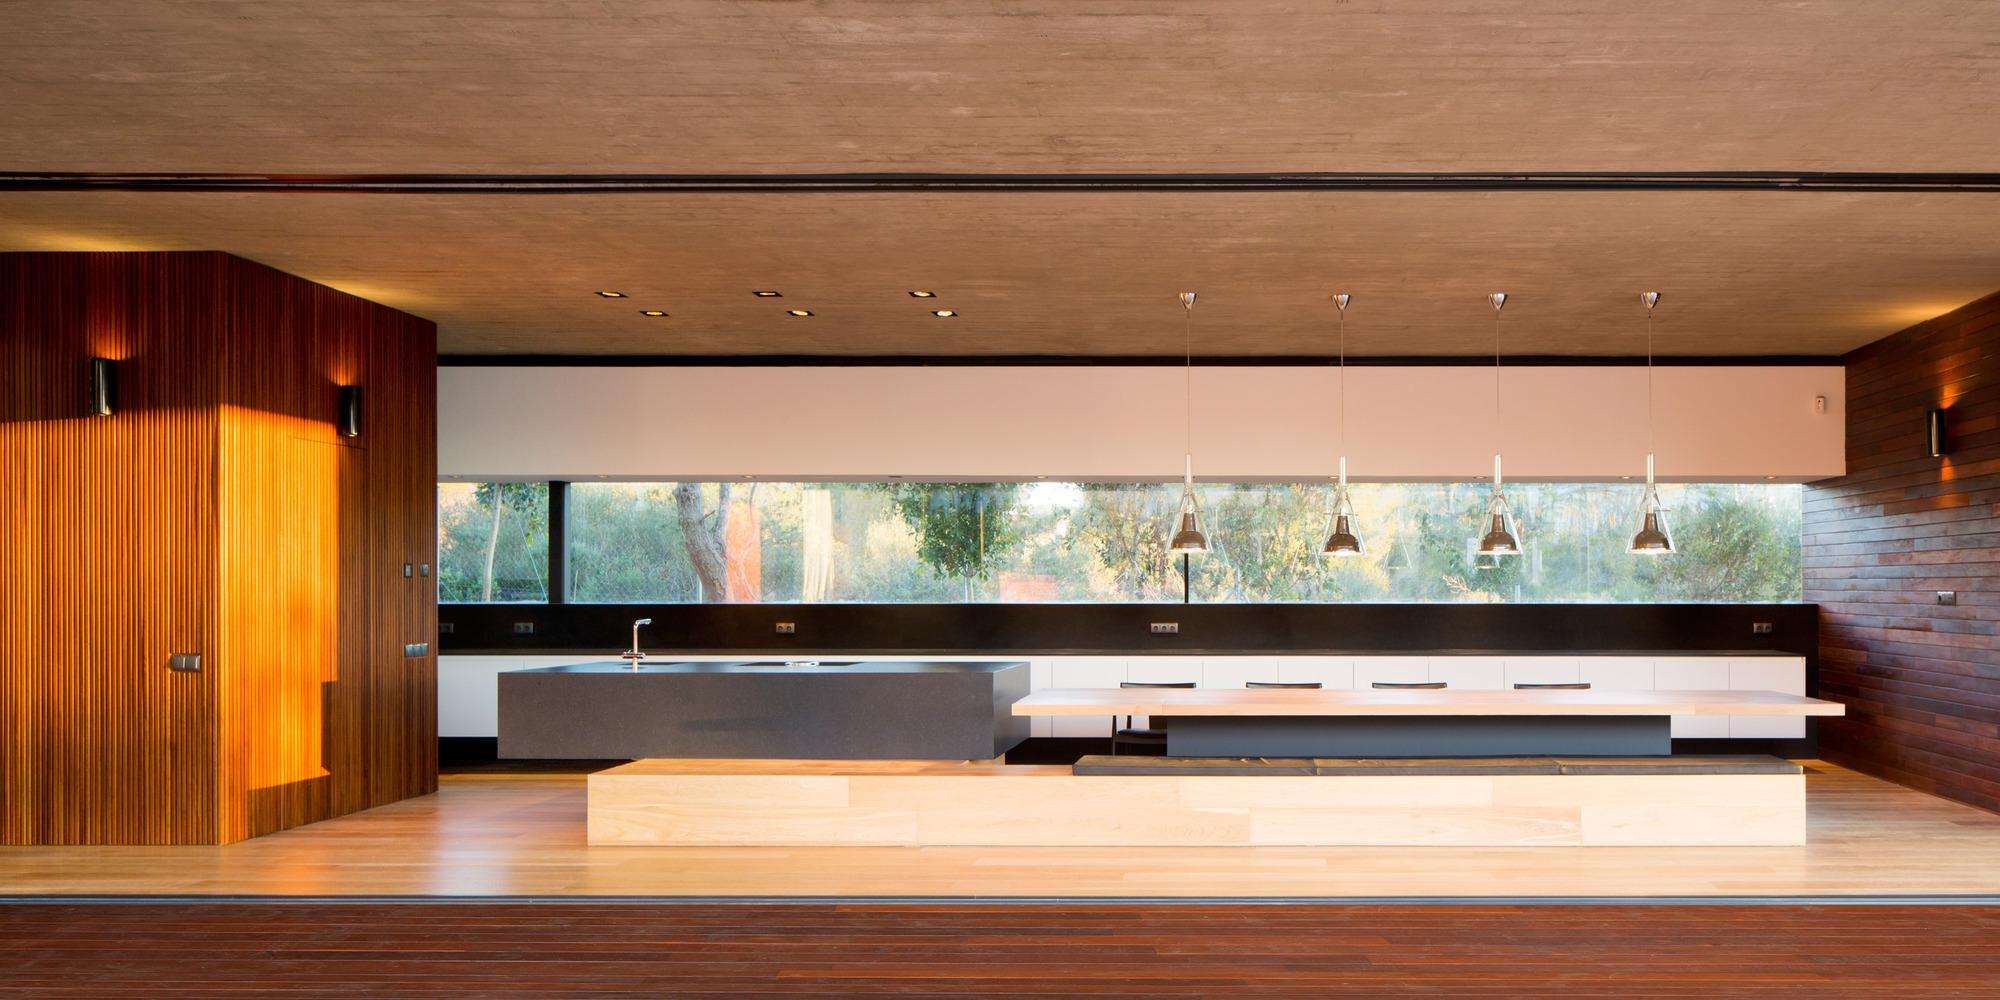 galer a de casa l20 olarq osvaldo luppi architects 18. Black Bedroom Furniture Sets. Home Design Ideas